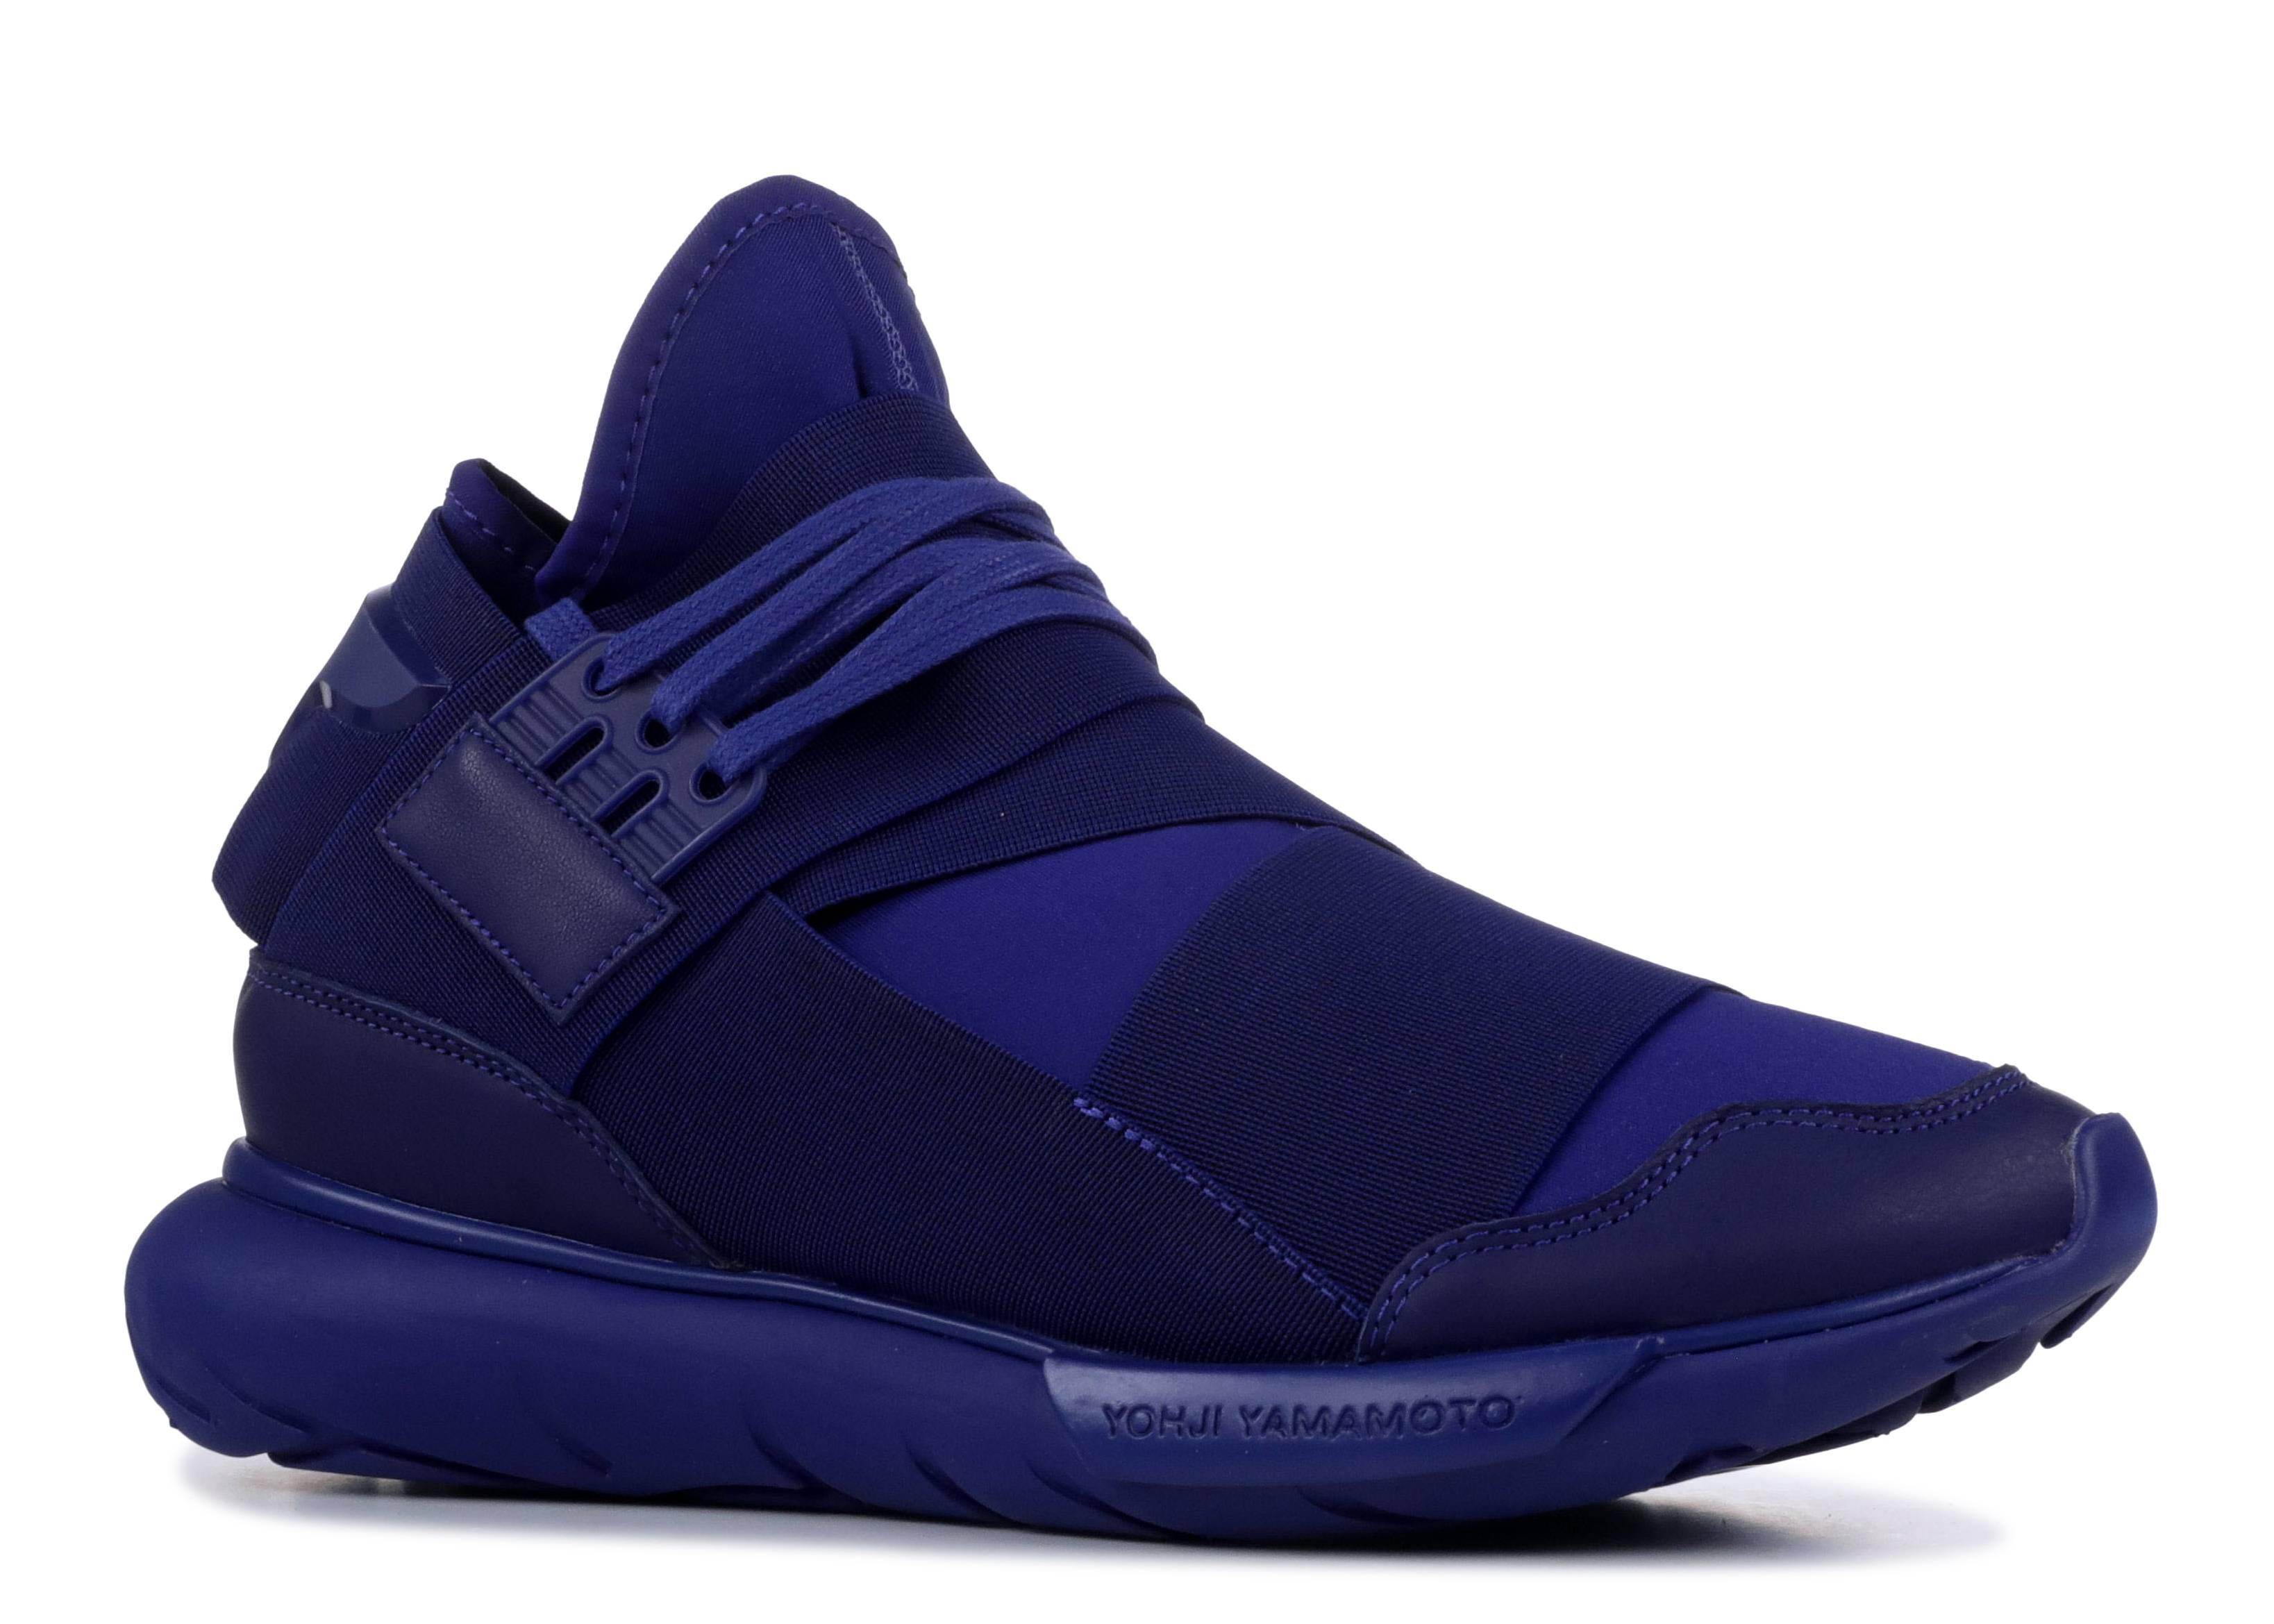 c1b4485bbe8a Y-3 Qasa High - Adidas - s82124 - purple amazon purple